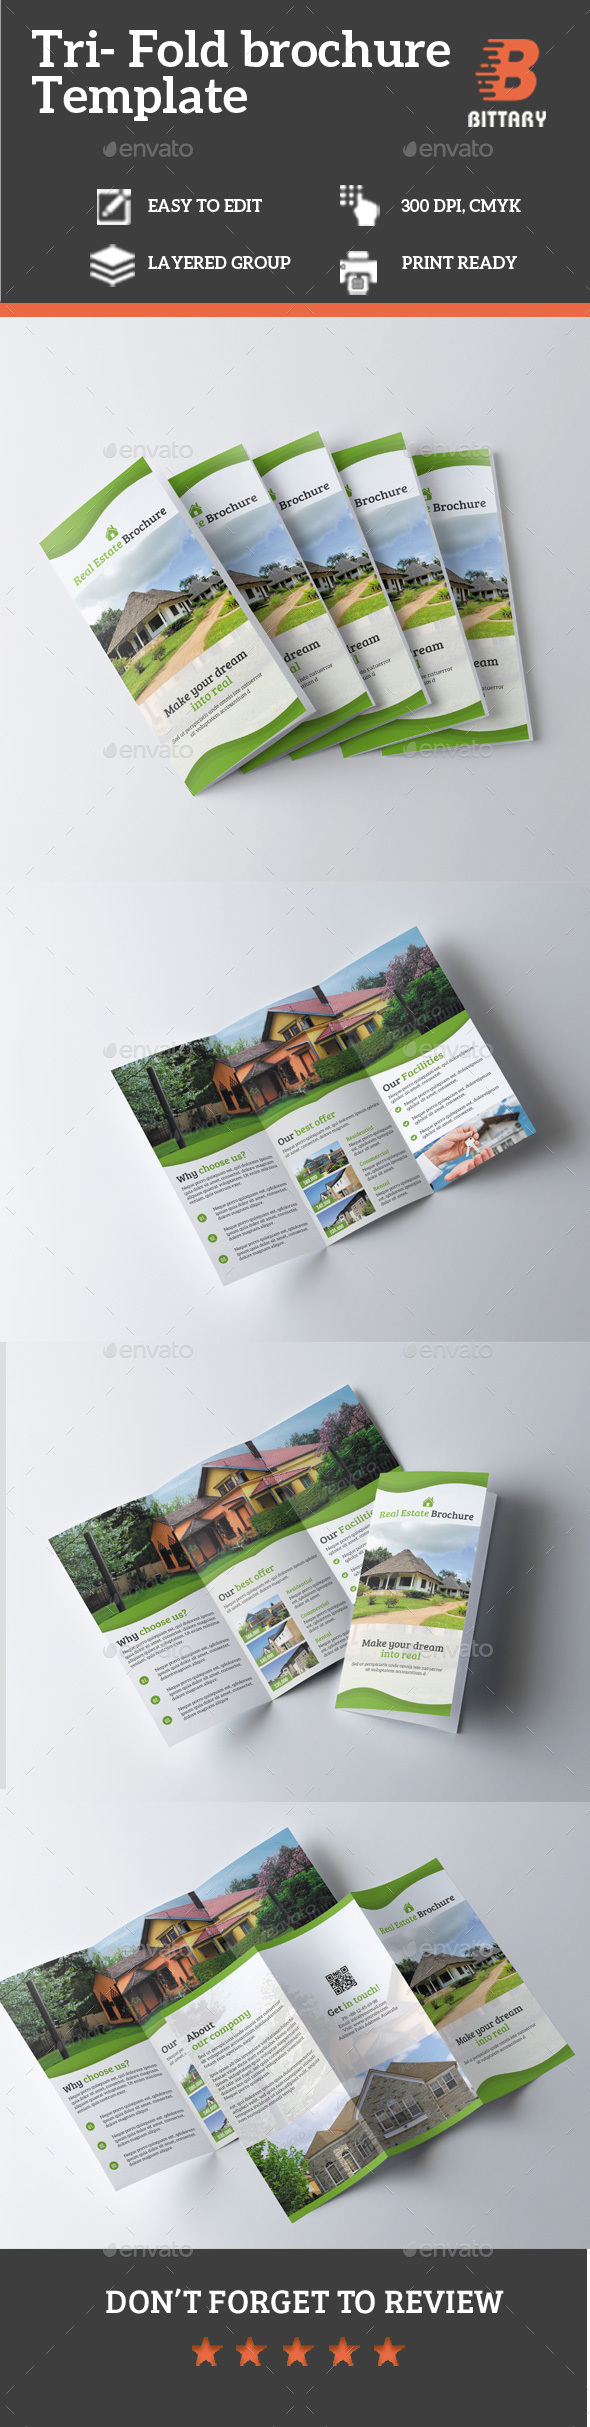 Real Estate TriFold Brochure  Tri Fold Brochure Tri Fold